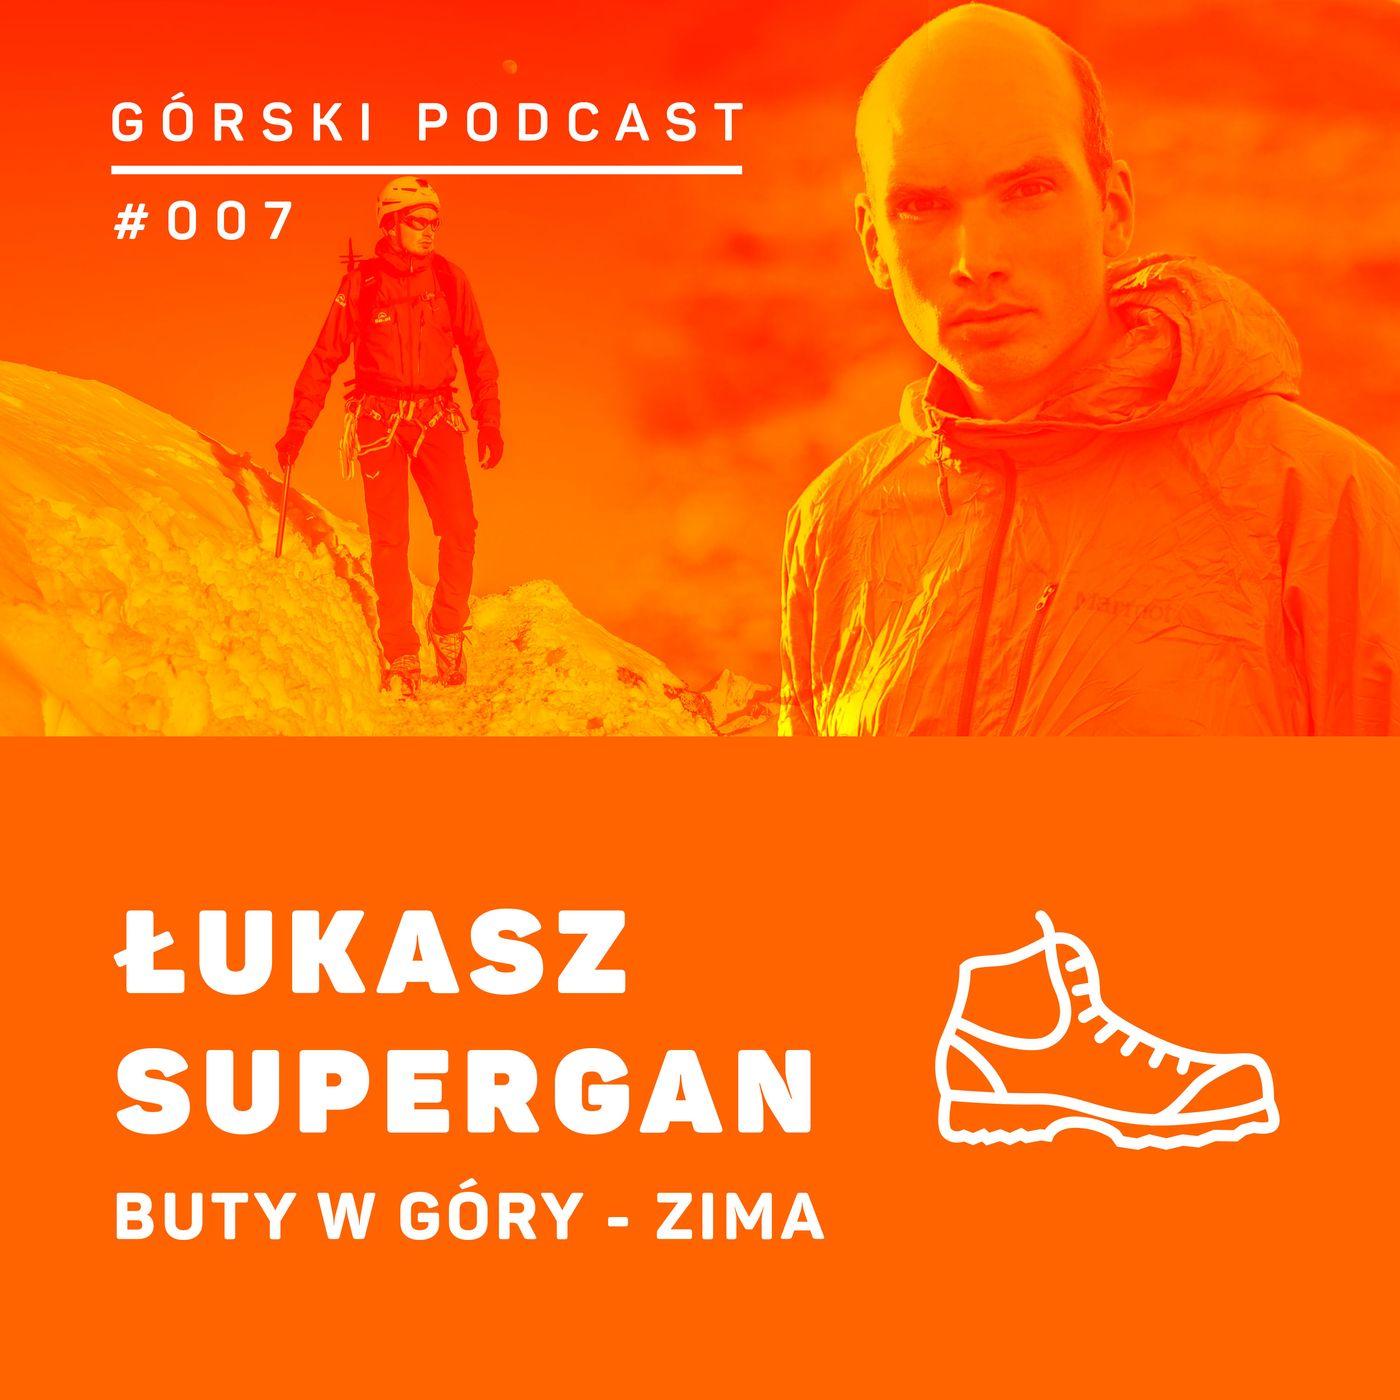 #007 8a.pl - Łukasz Supergan. Buty w góry zimą.